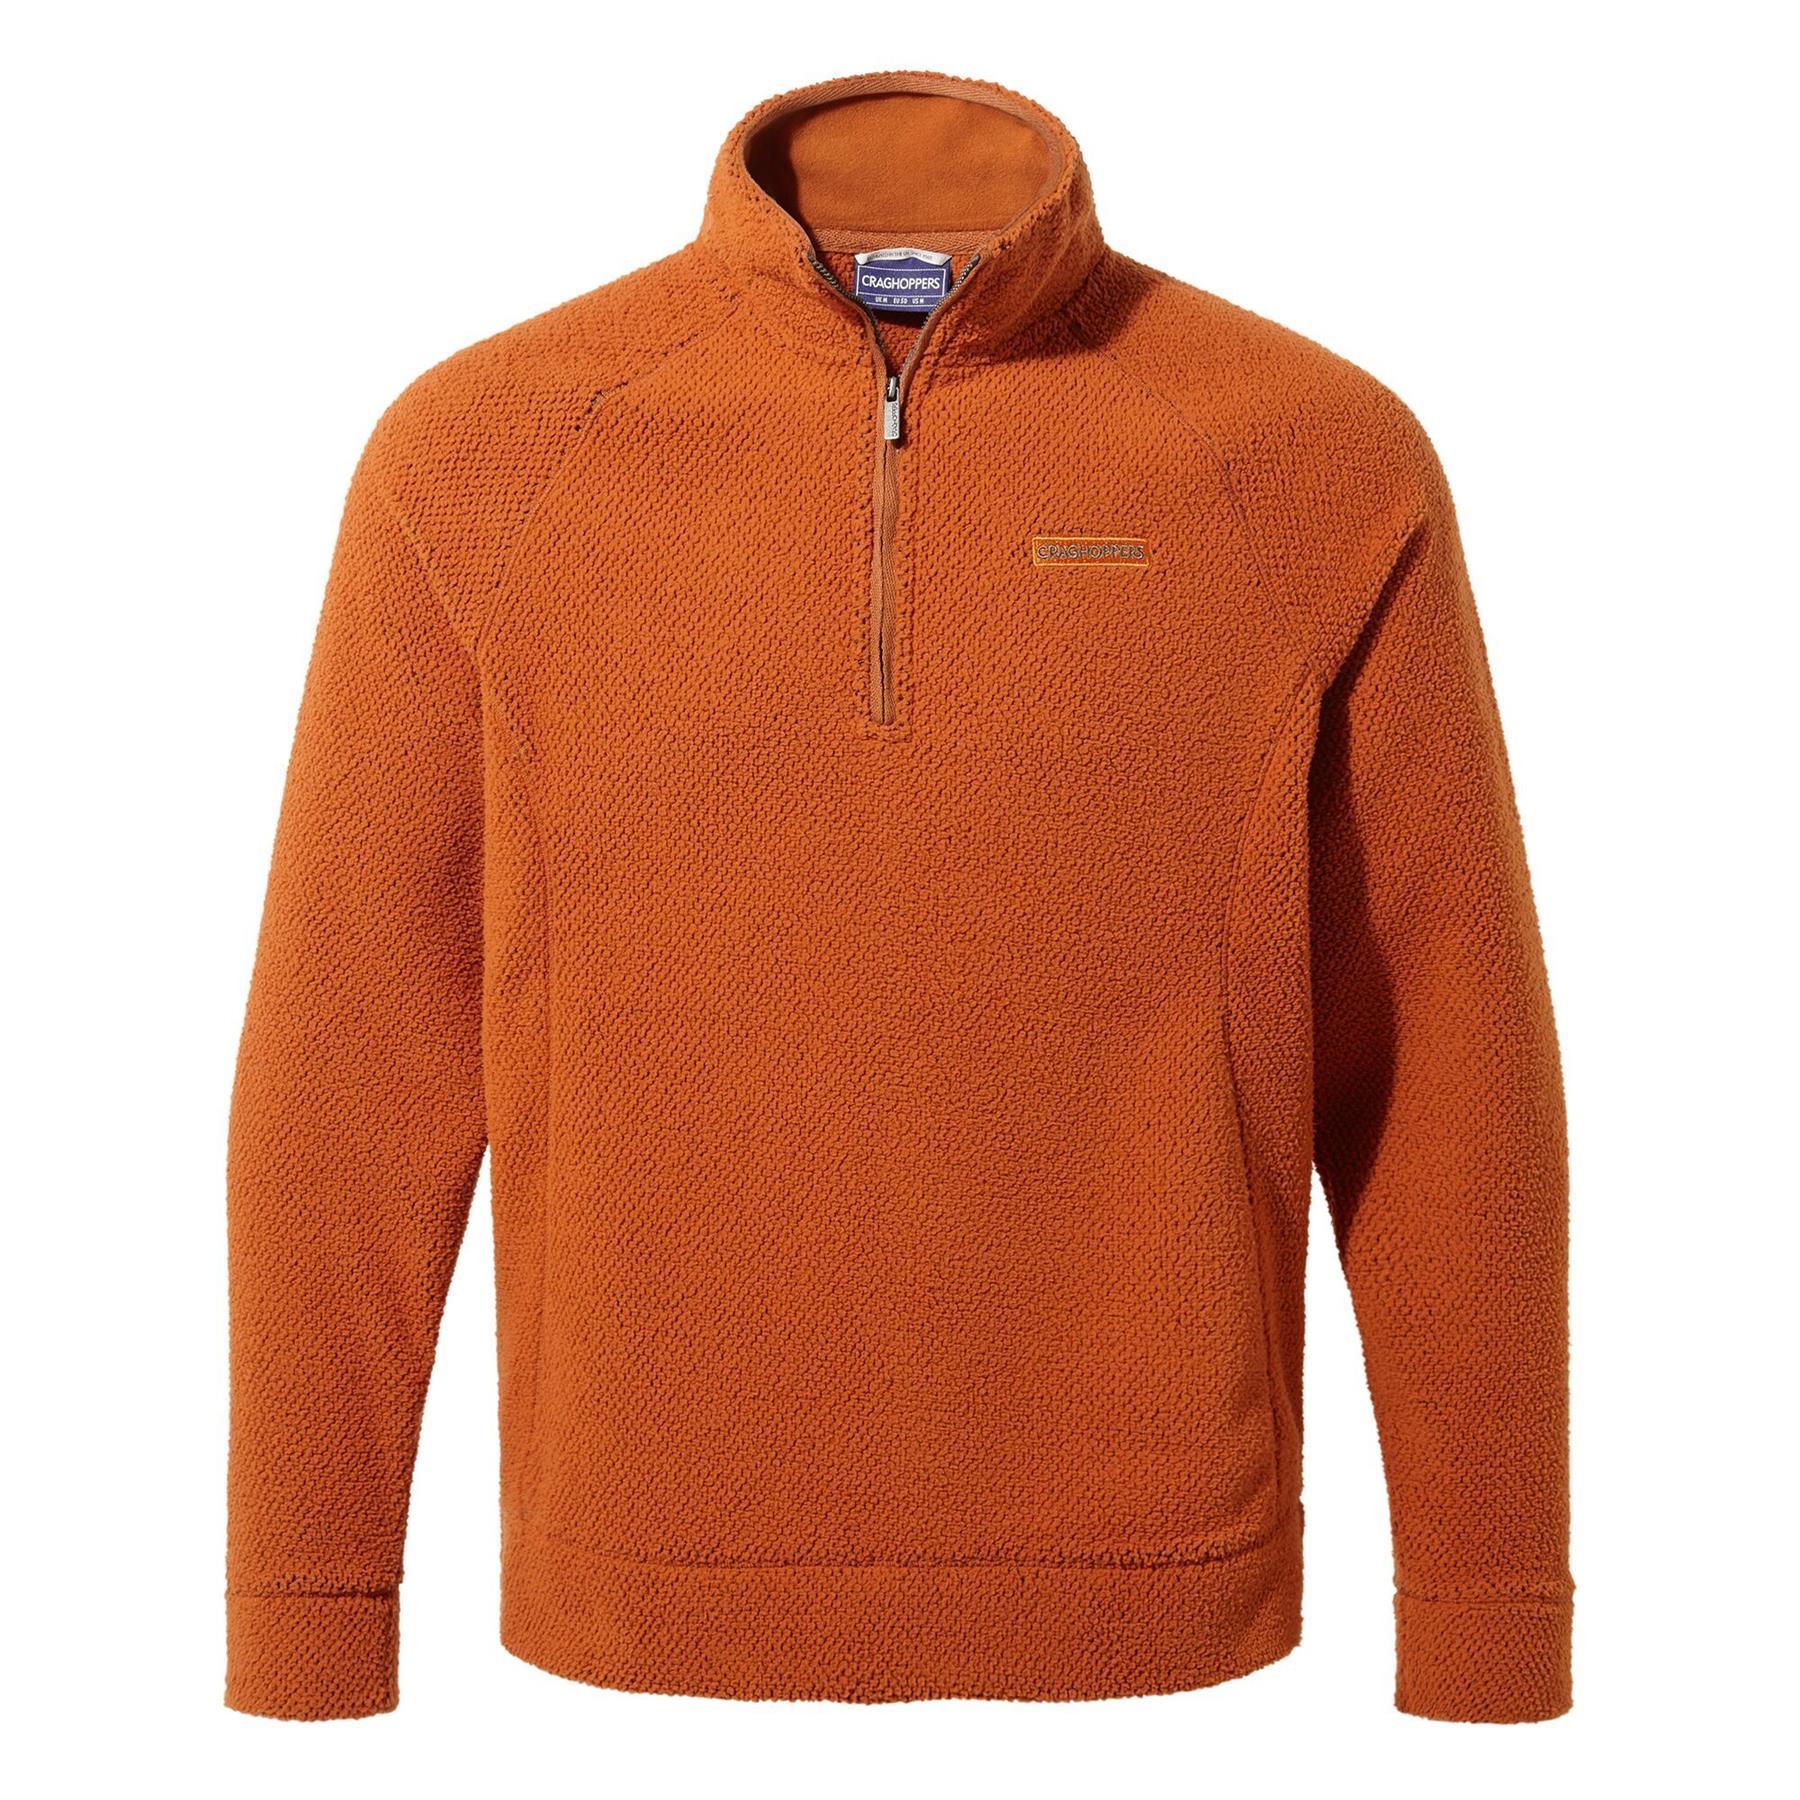 miniatuur 15 - Craghopper Mens Cason Fleece Half Zip Bobble Soft Jumper Pullover Sweater